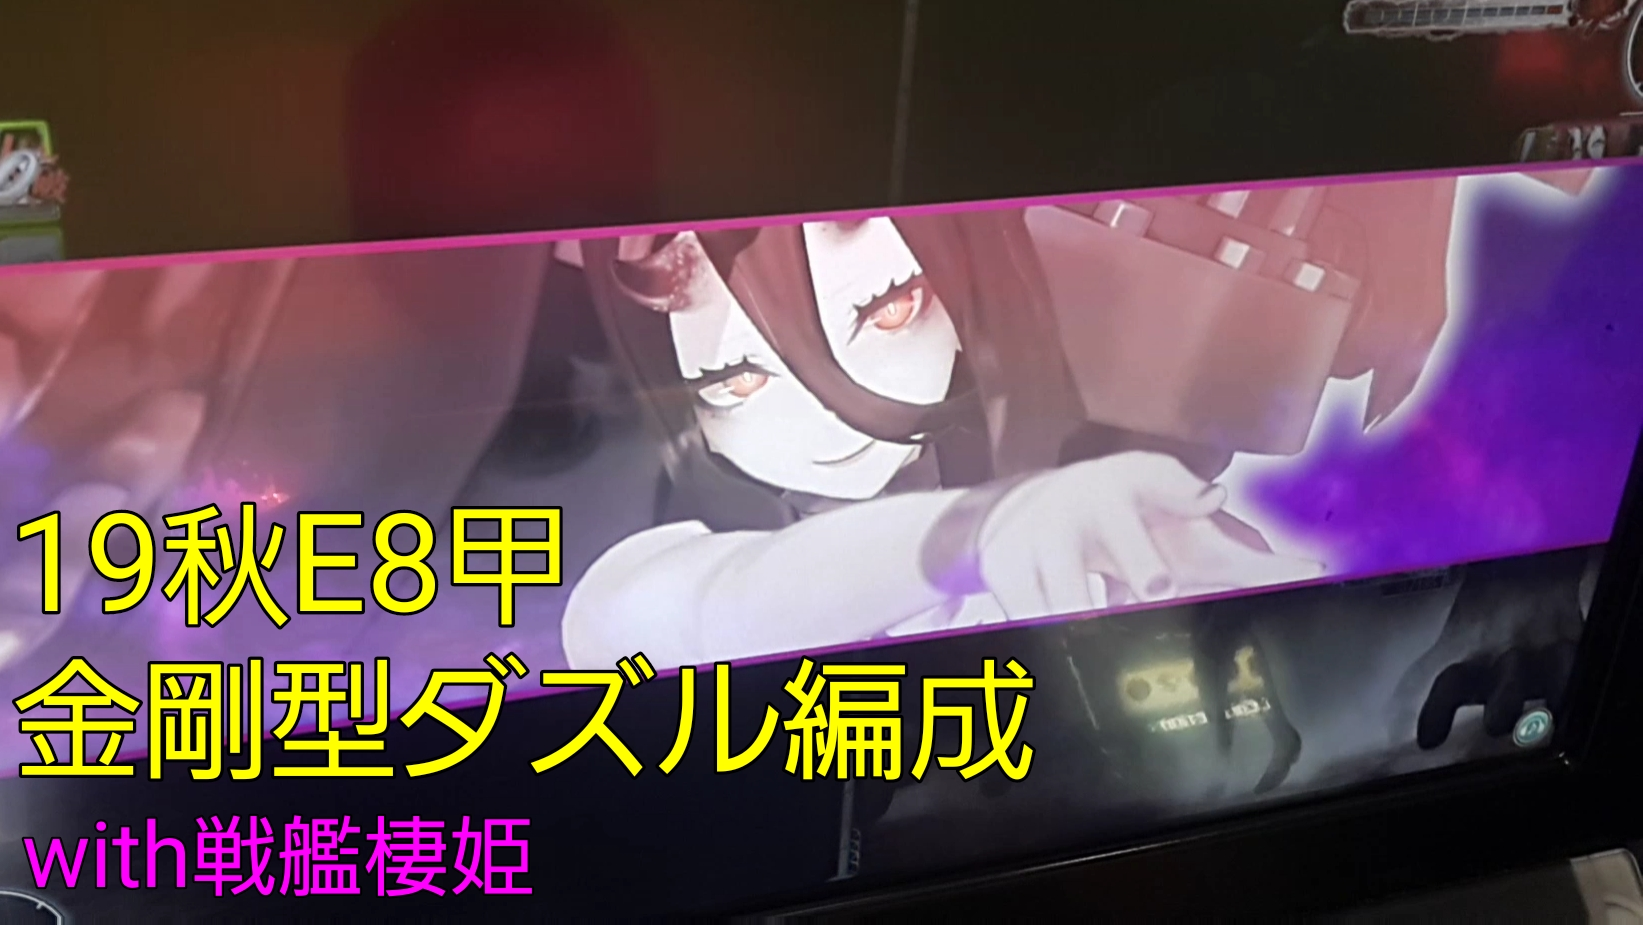 【AC】アンズ環礁泊地撃滅作戦(19秋E8甲) 戦艦5重巡1 プレイ動画